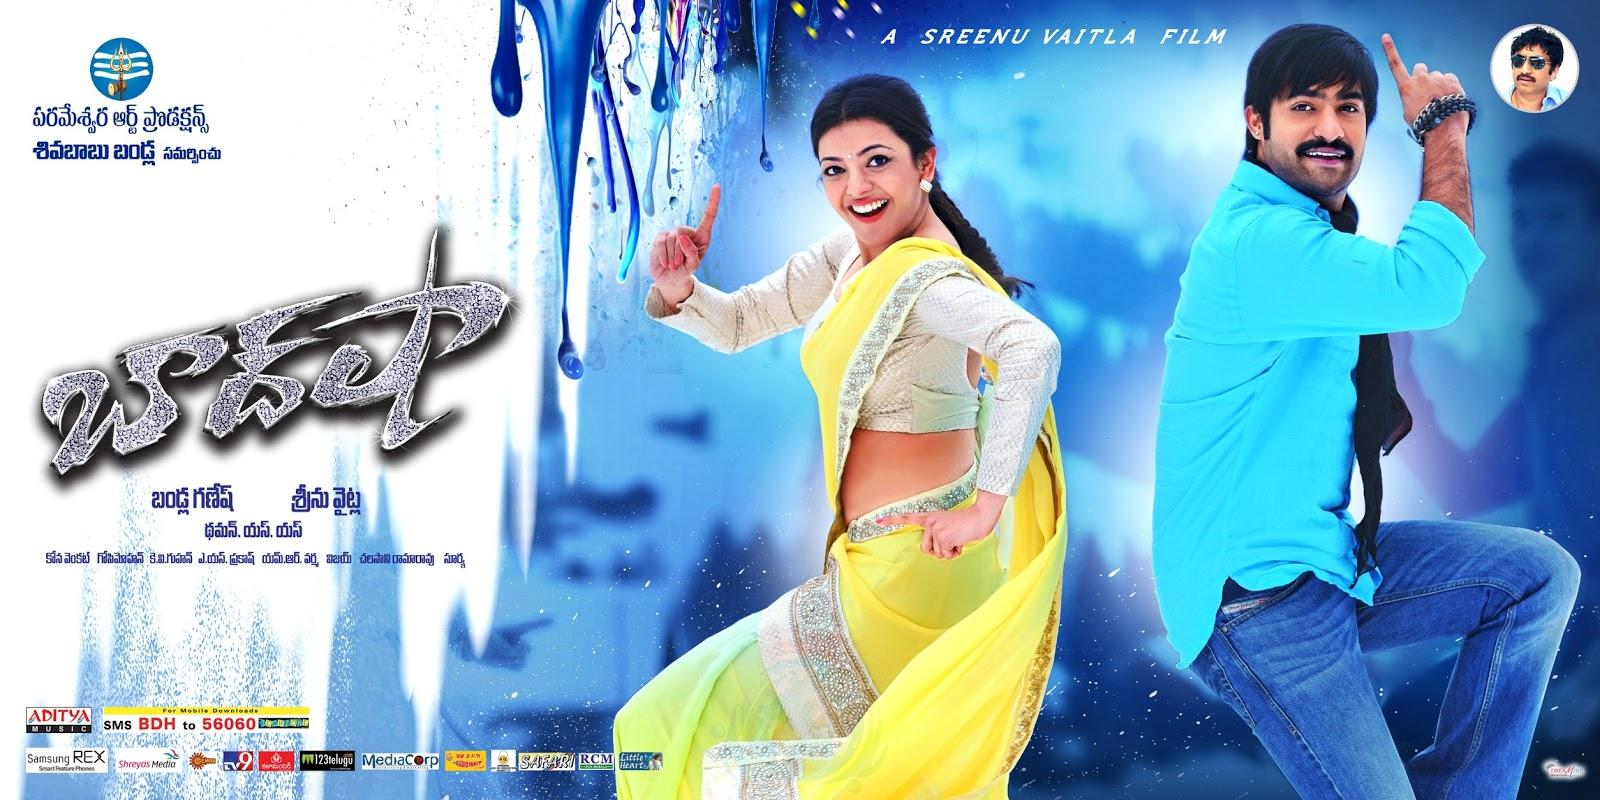 Badshah Tamil Movie Hindi Dubbed Yamaha Rxv667 Home Cinema Receiver